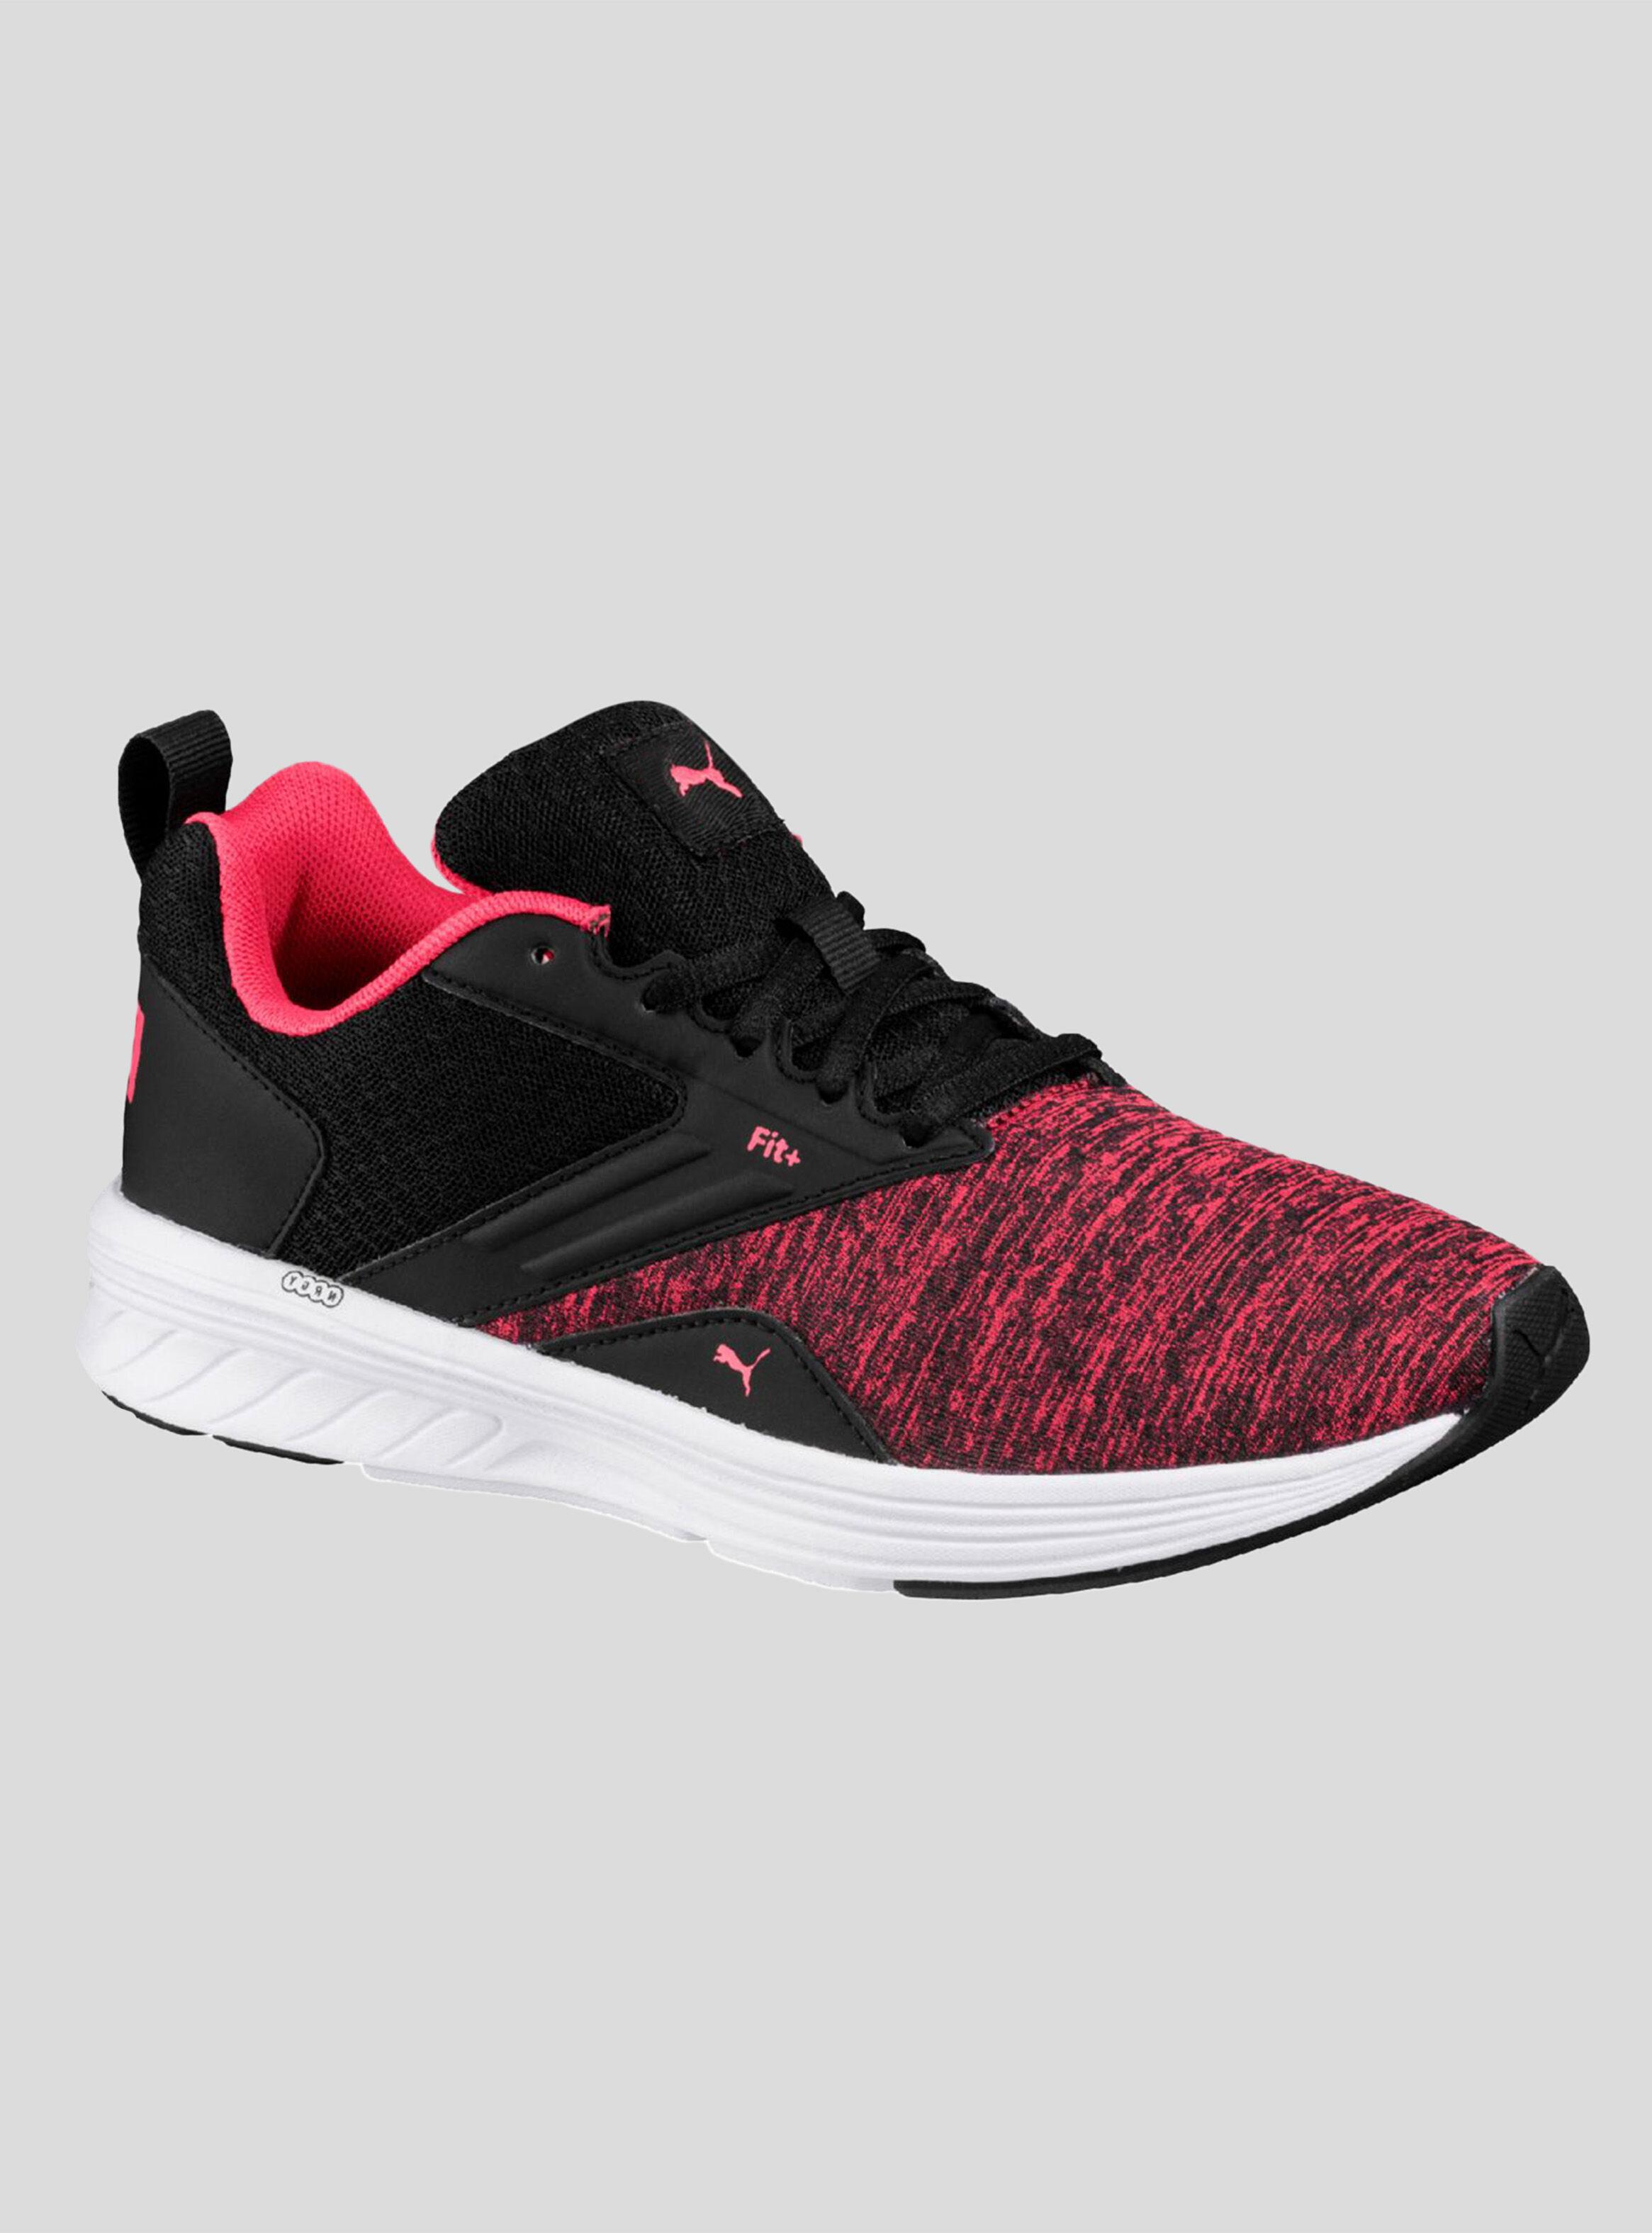 calzado running mujer puma